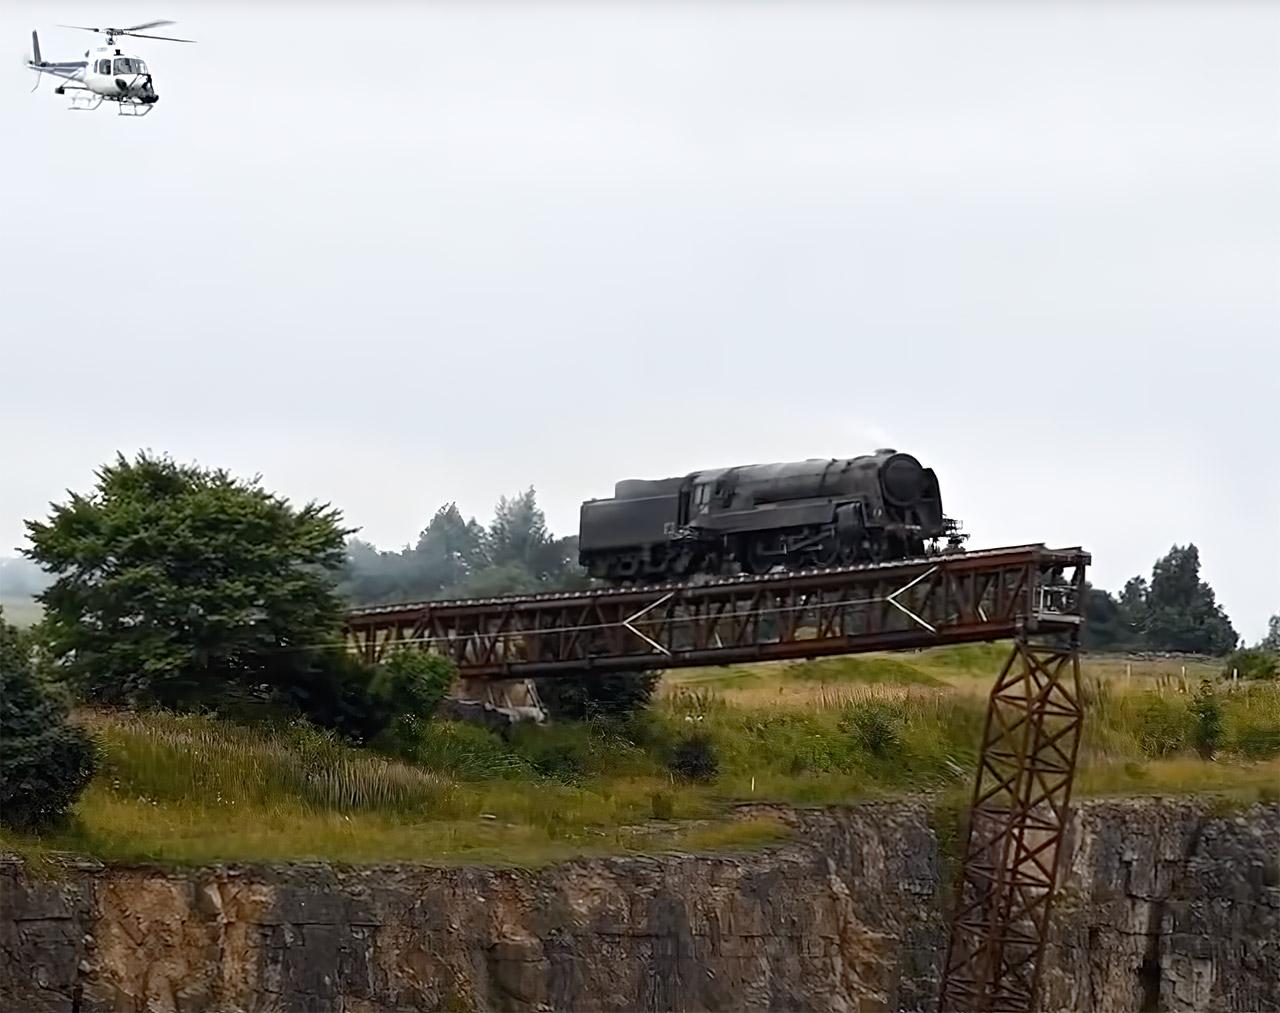 Mission Impossible 7 Train Crash Stunt